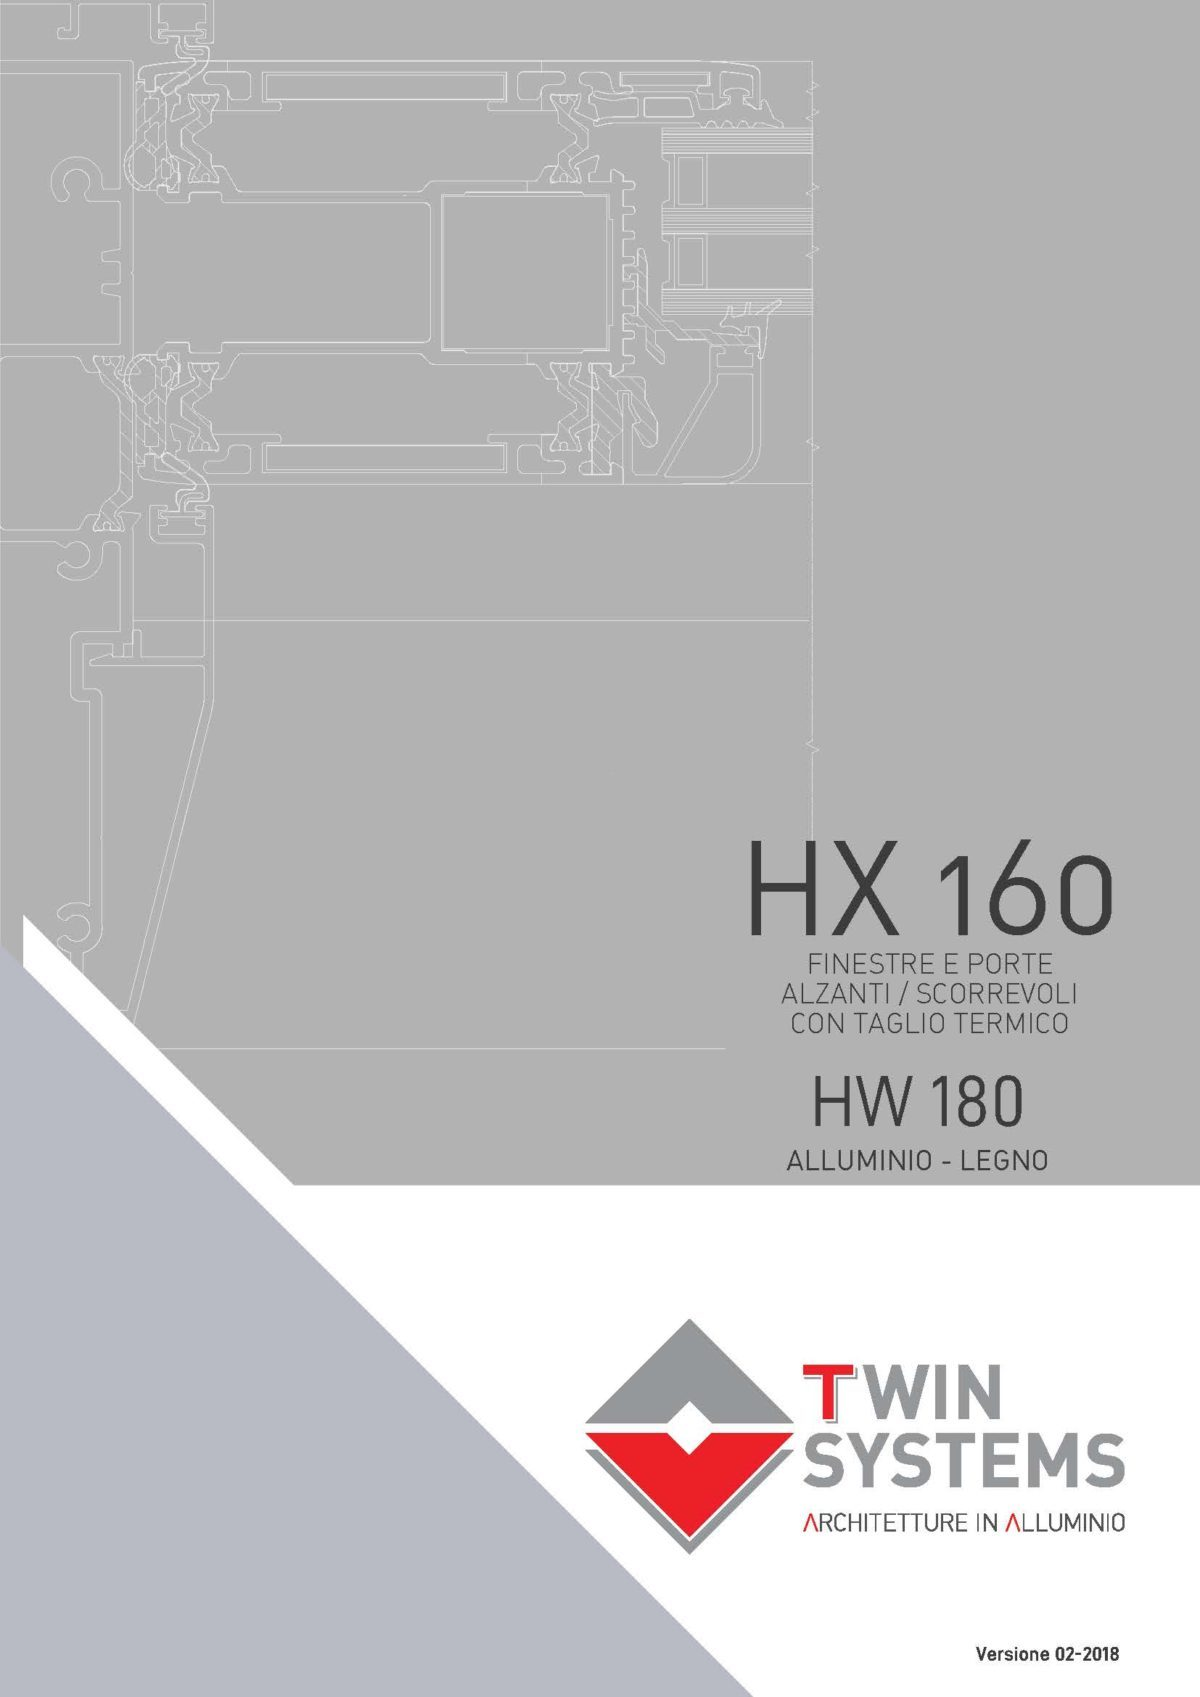 Twinsystems HX160 - HW180